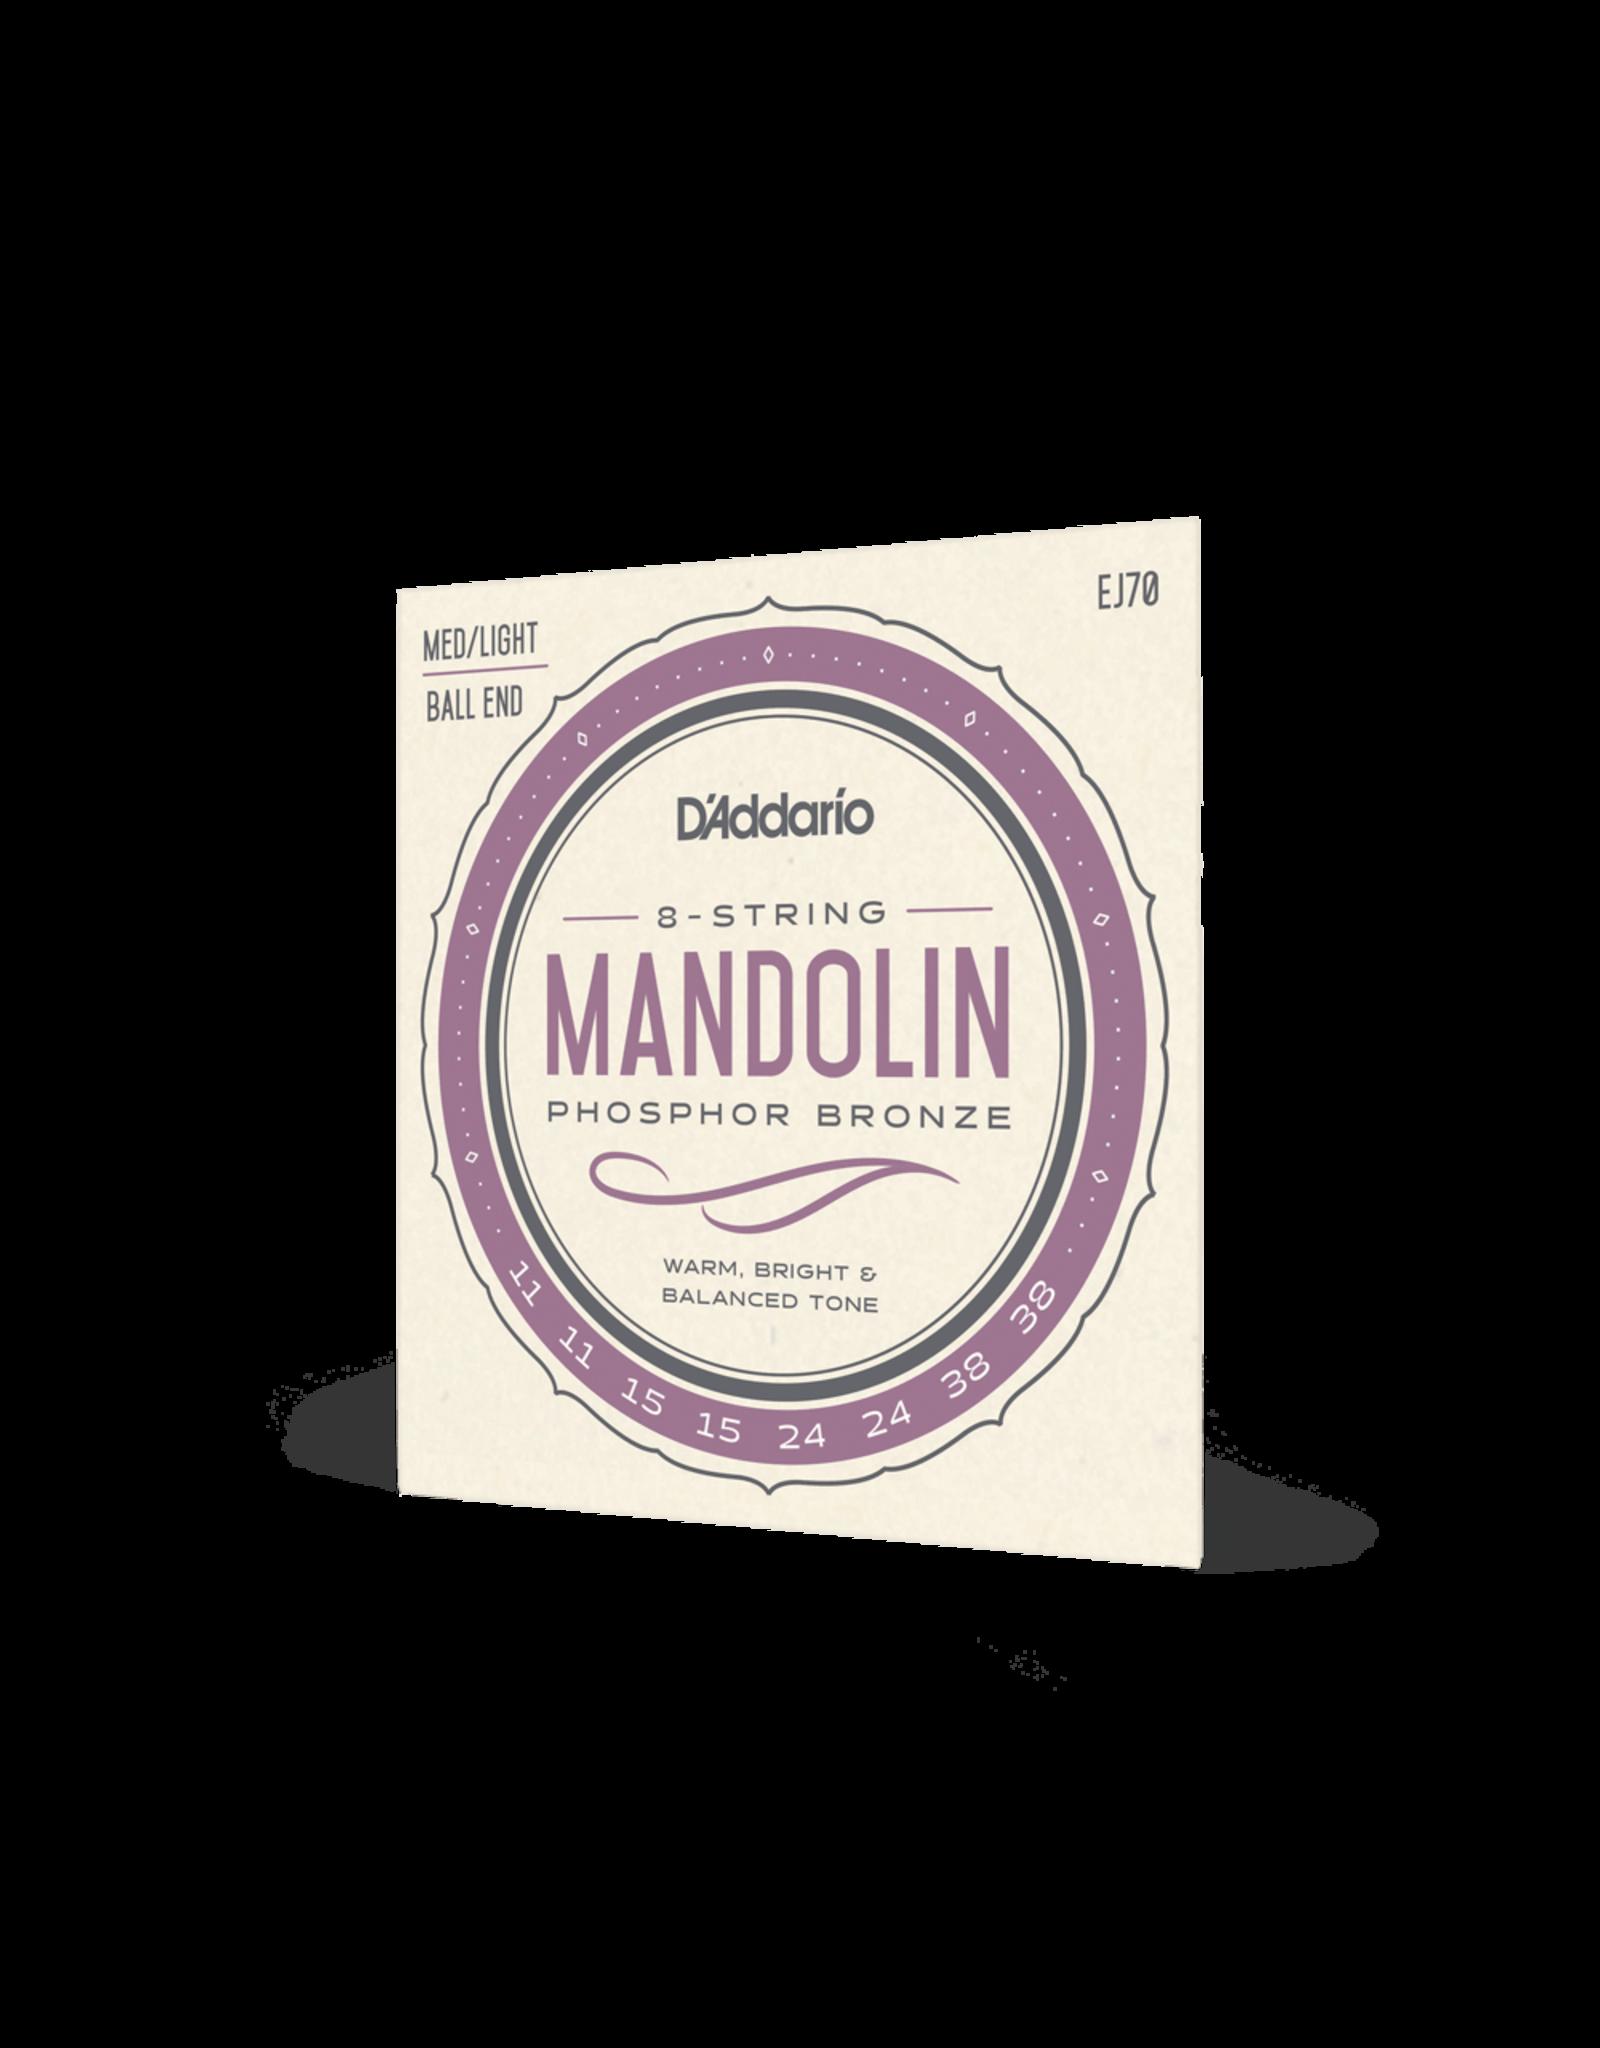 D'Addario D'Addario EJ70 Phosphor Bronze Ball End Mandolin Strings